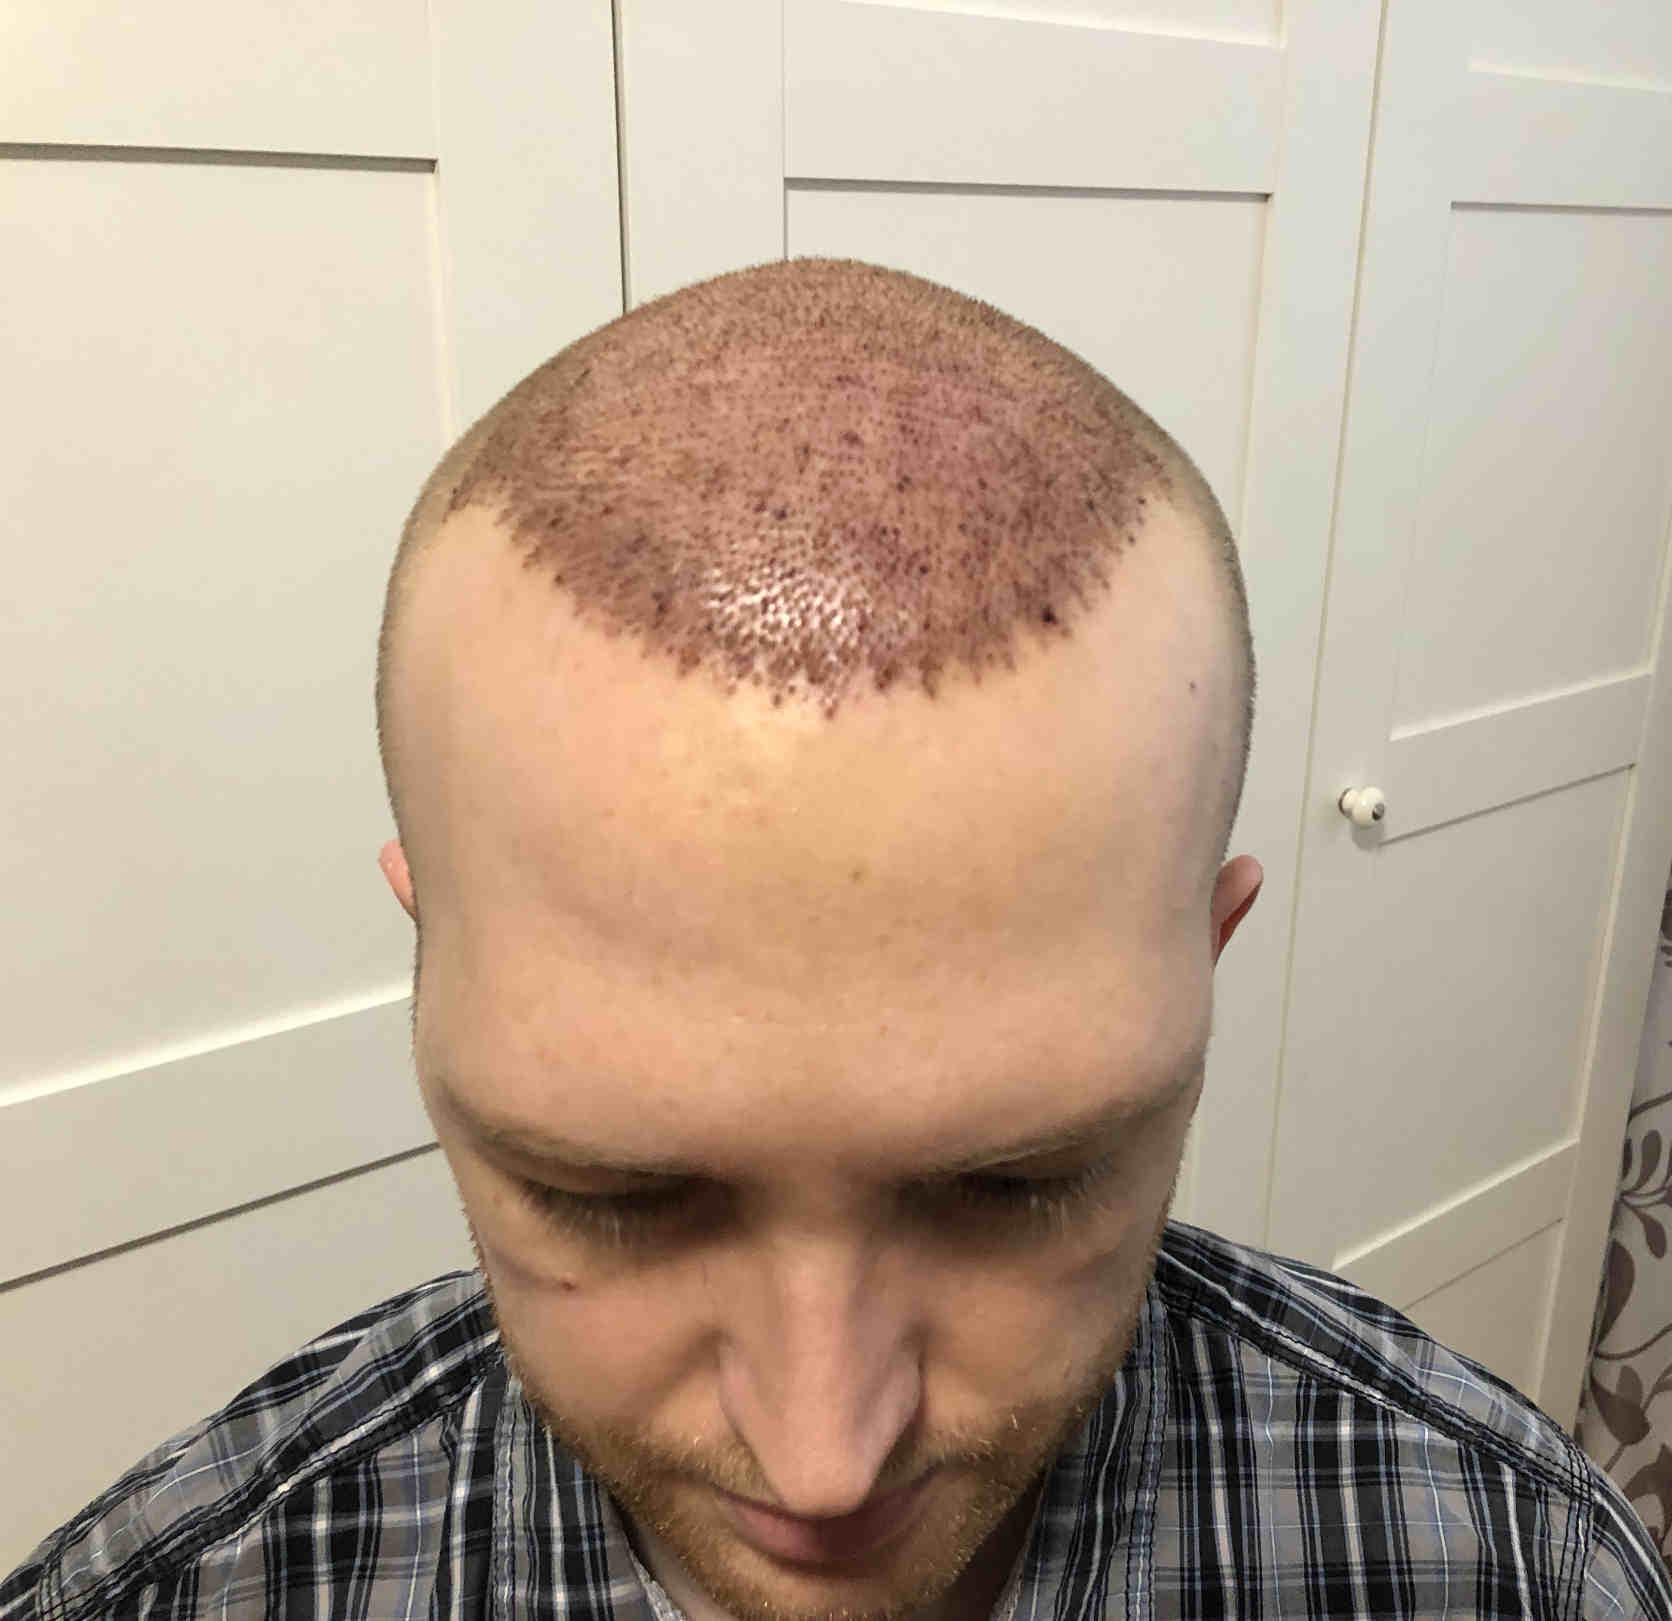 1. Tag nach Haartransplantation